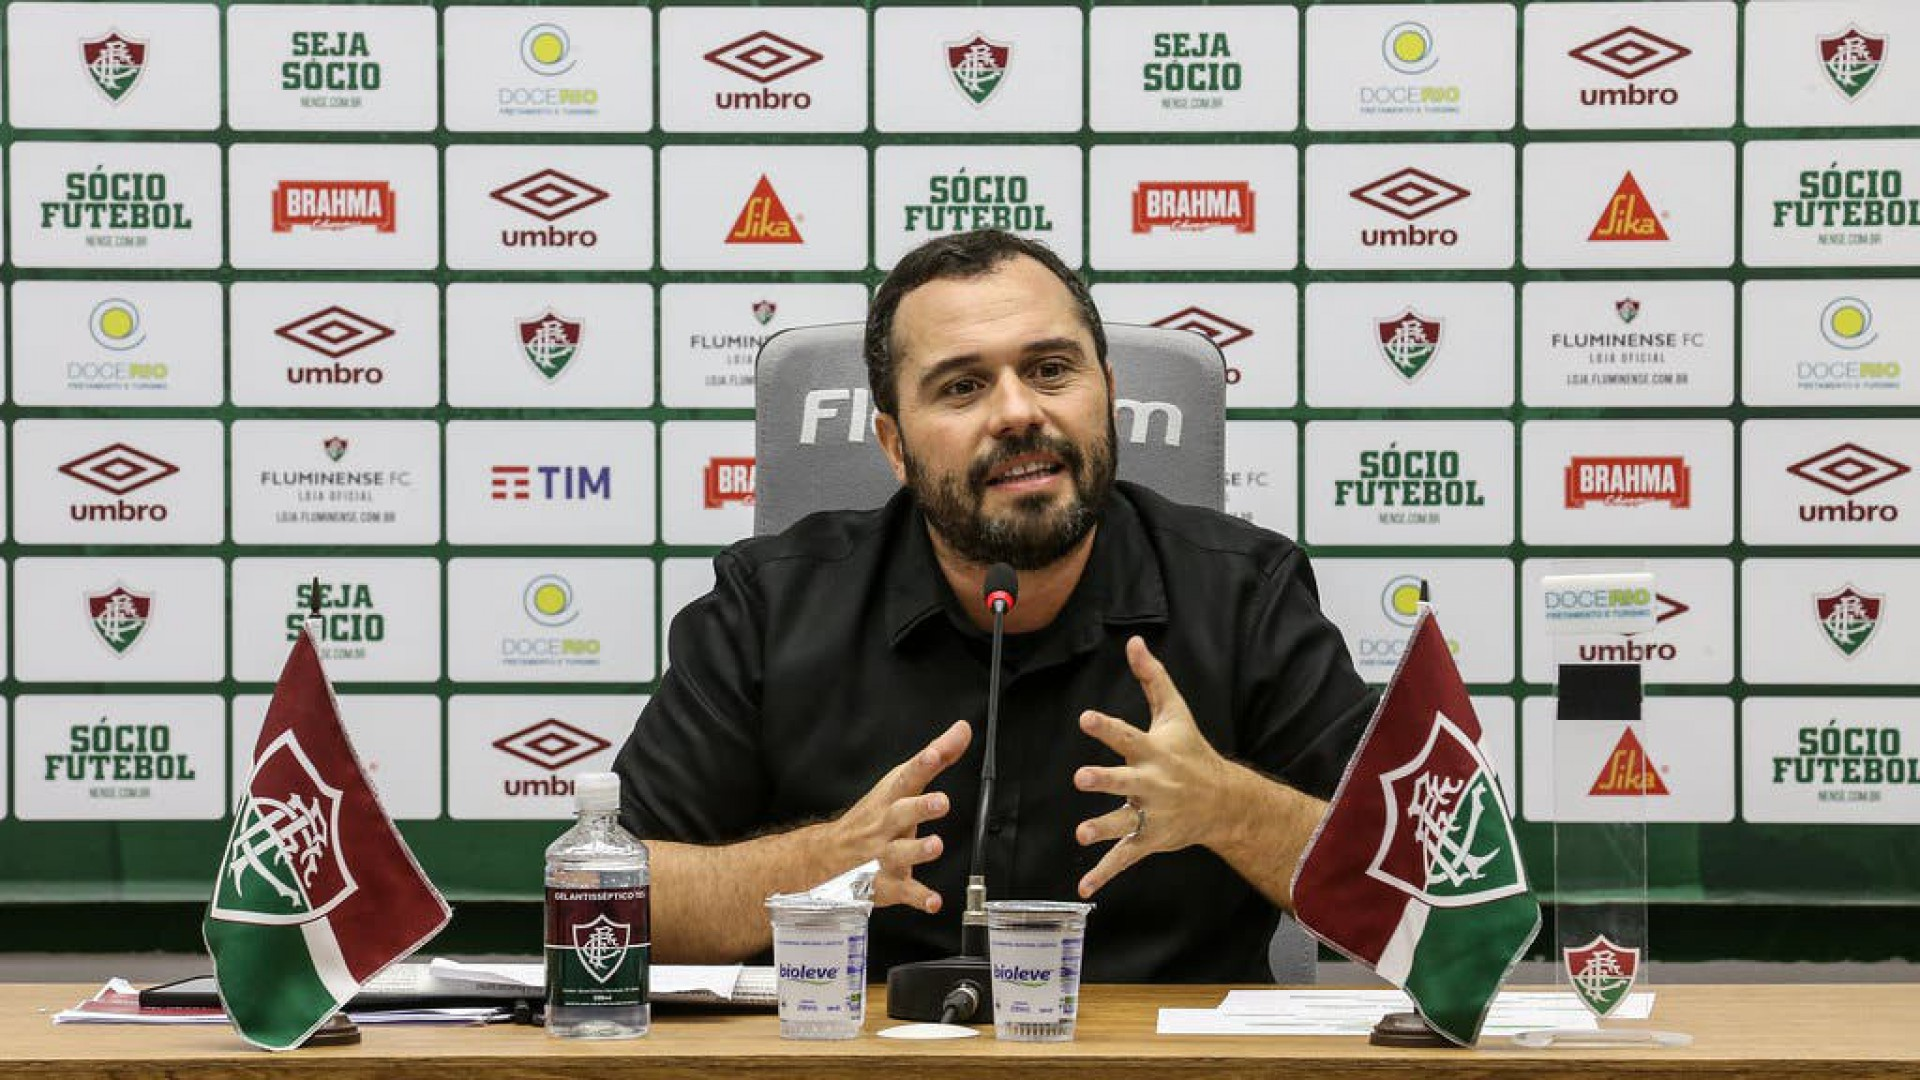 Zagueiro rescinde contrato com Fluminense e vai jogar no Azerbaijão